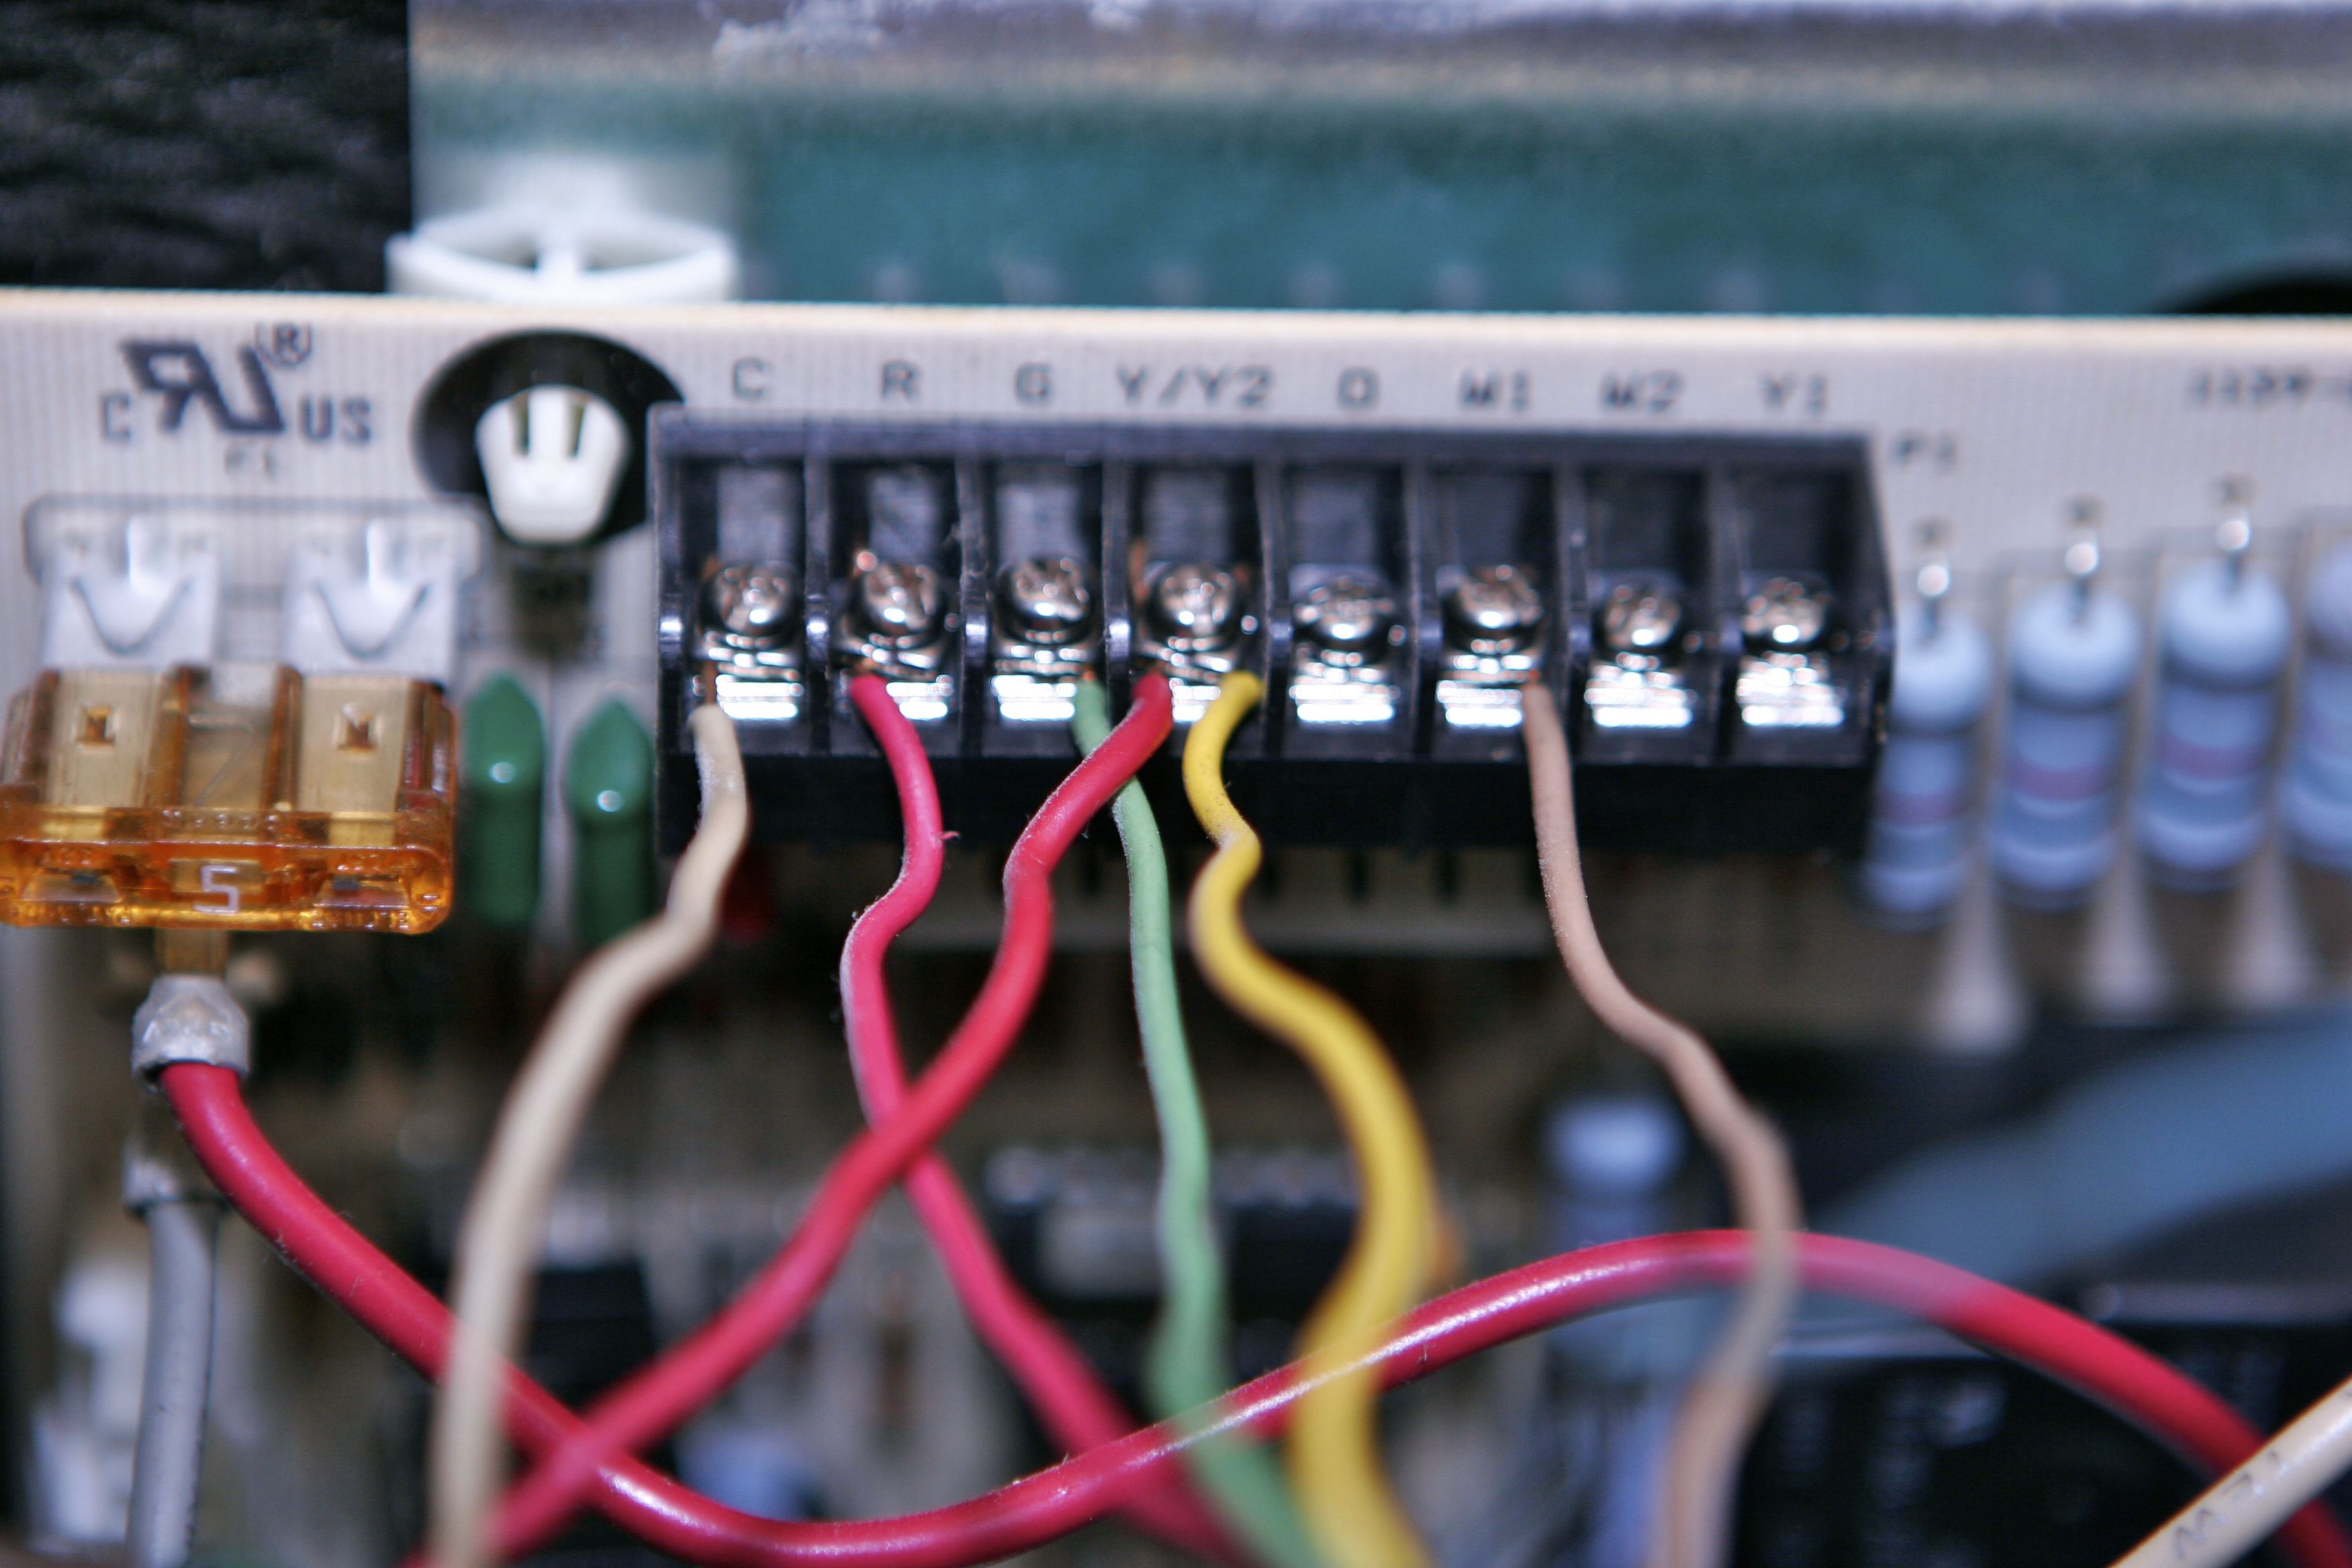 wiring diagram for nordyne gb5bm t49k c nordyne wiring nordyne gb5bm wiring diagram nordyne wiring diagrams for